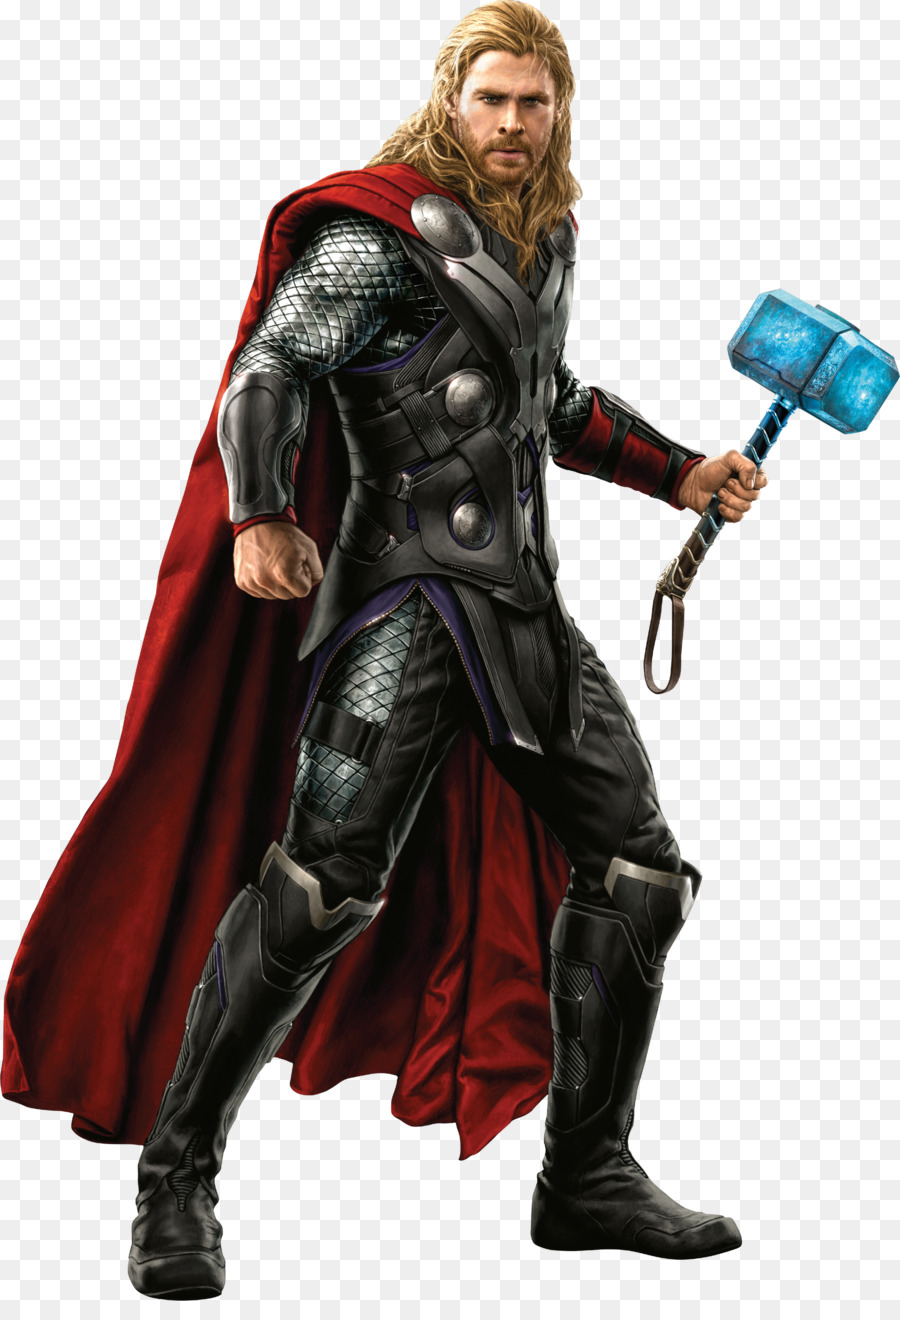 Avengers clipart thor, Avengers thor Transparent FREE for ...